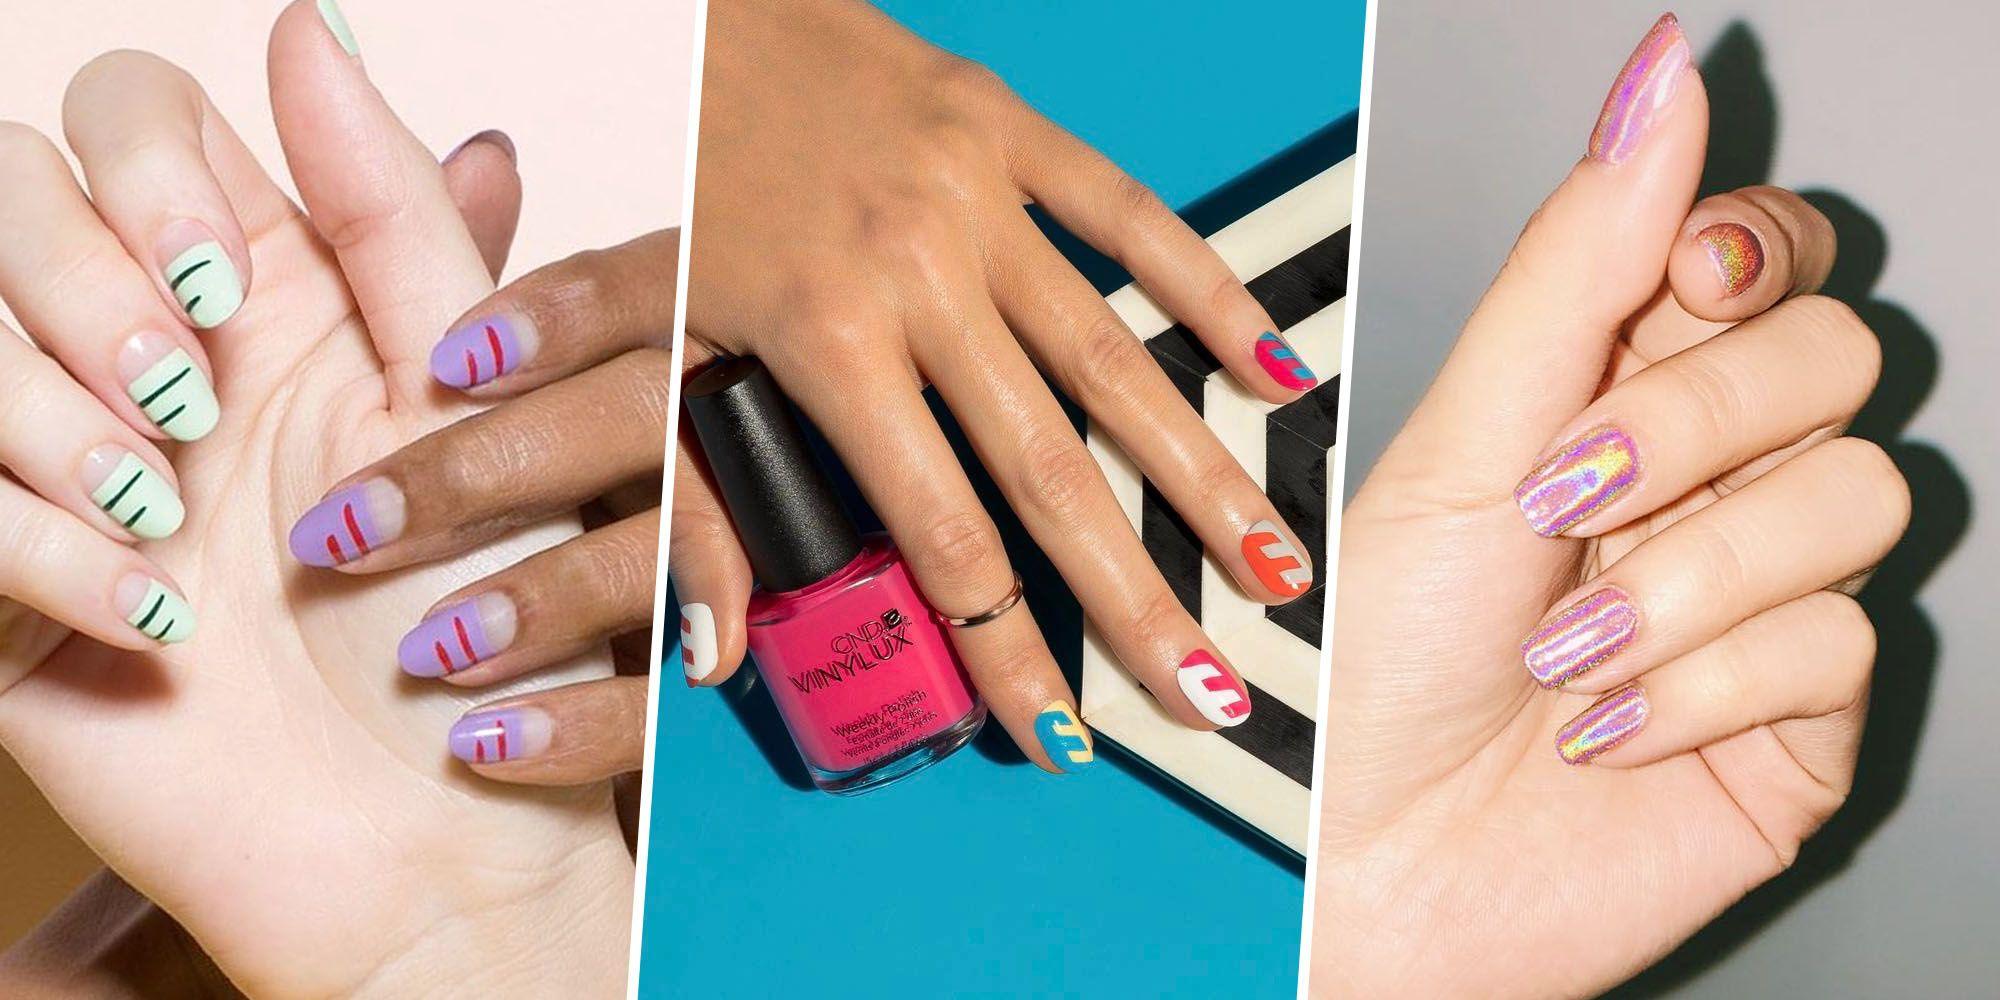 16 Creative Summer Nail Designs - 2017 Summer Nail Art Trends